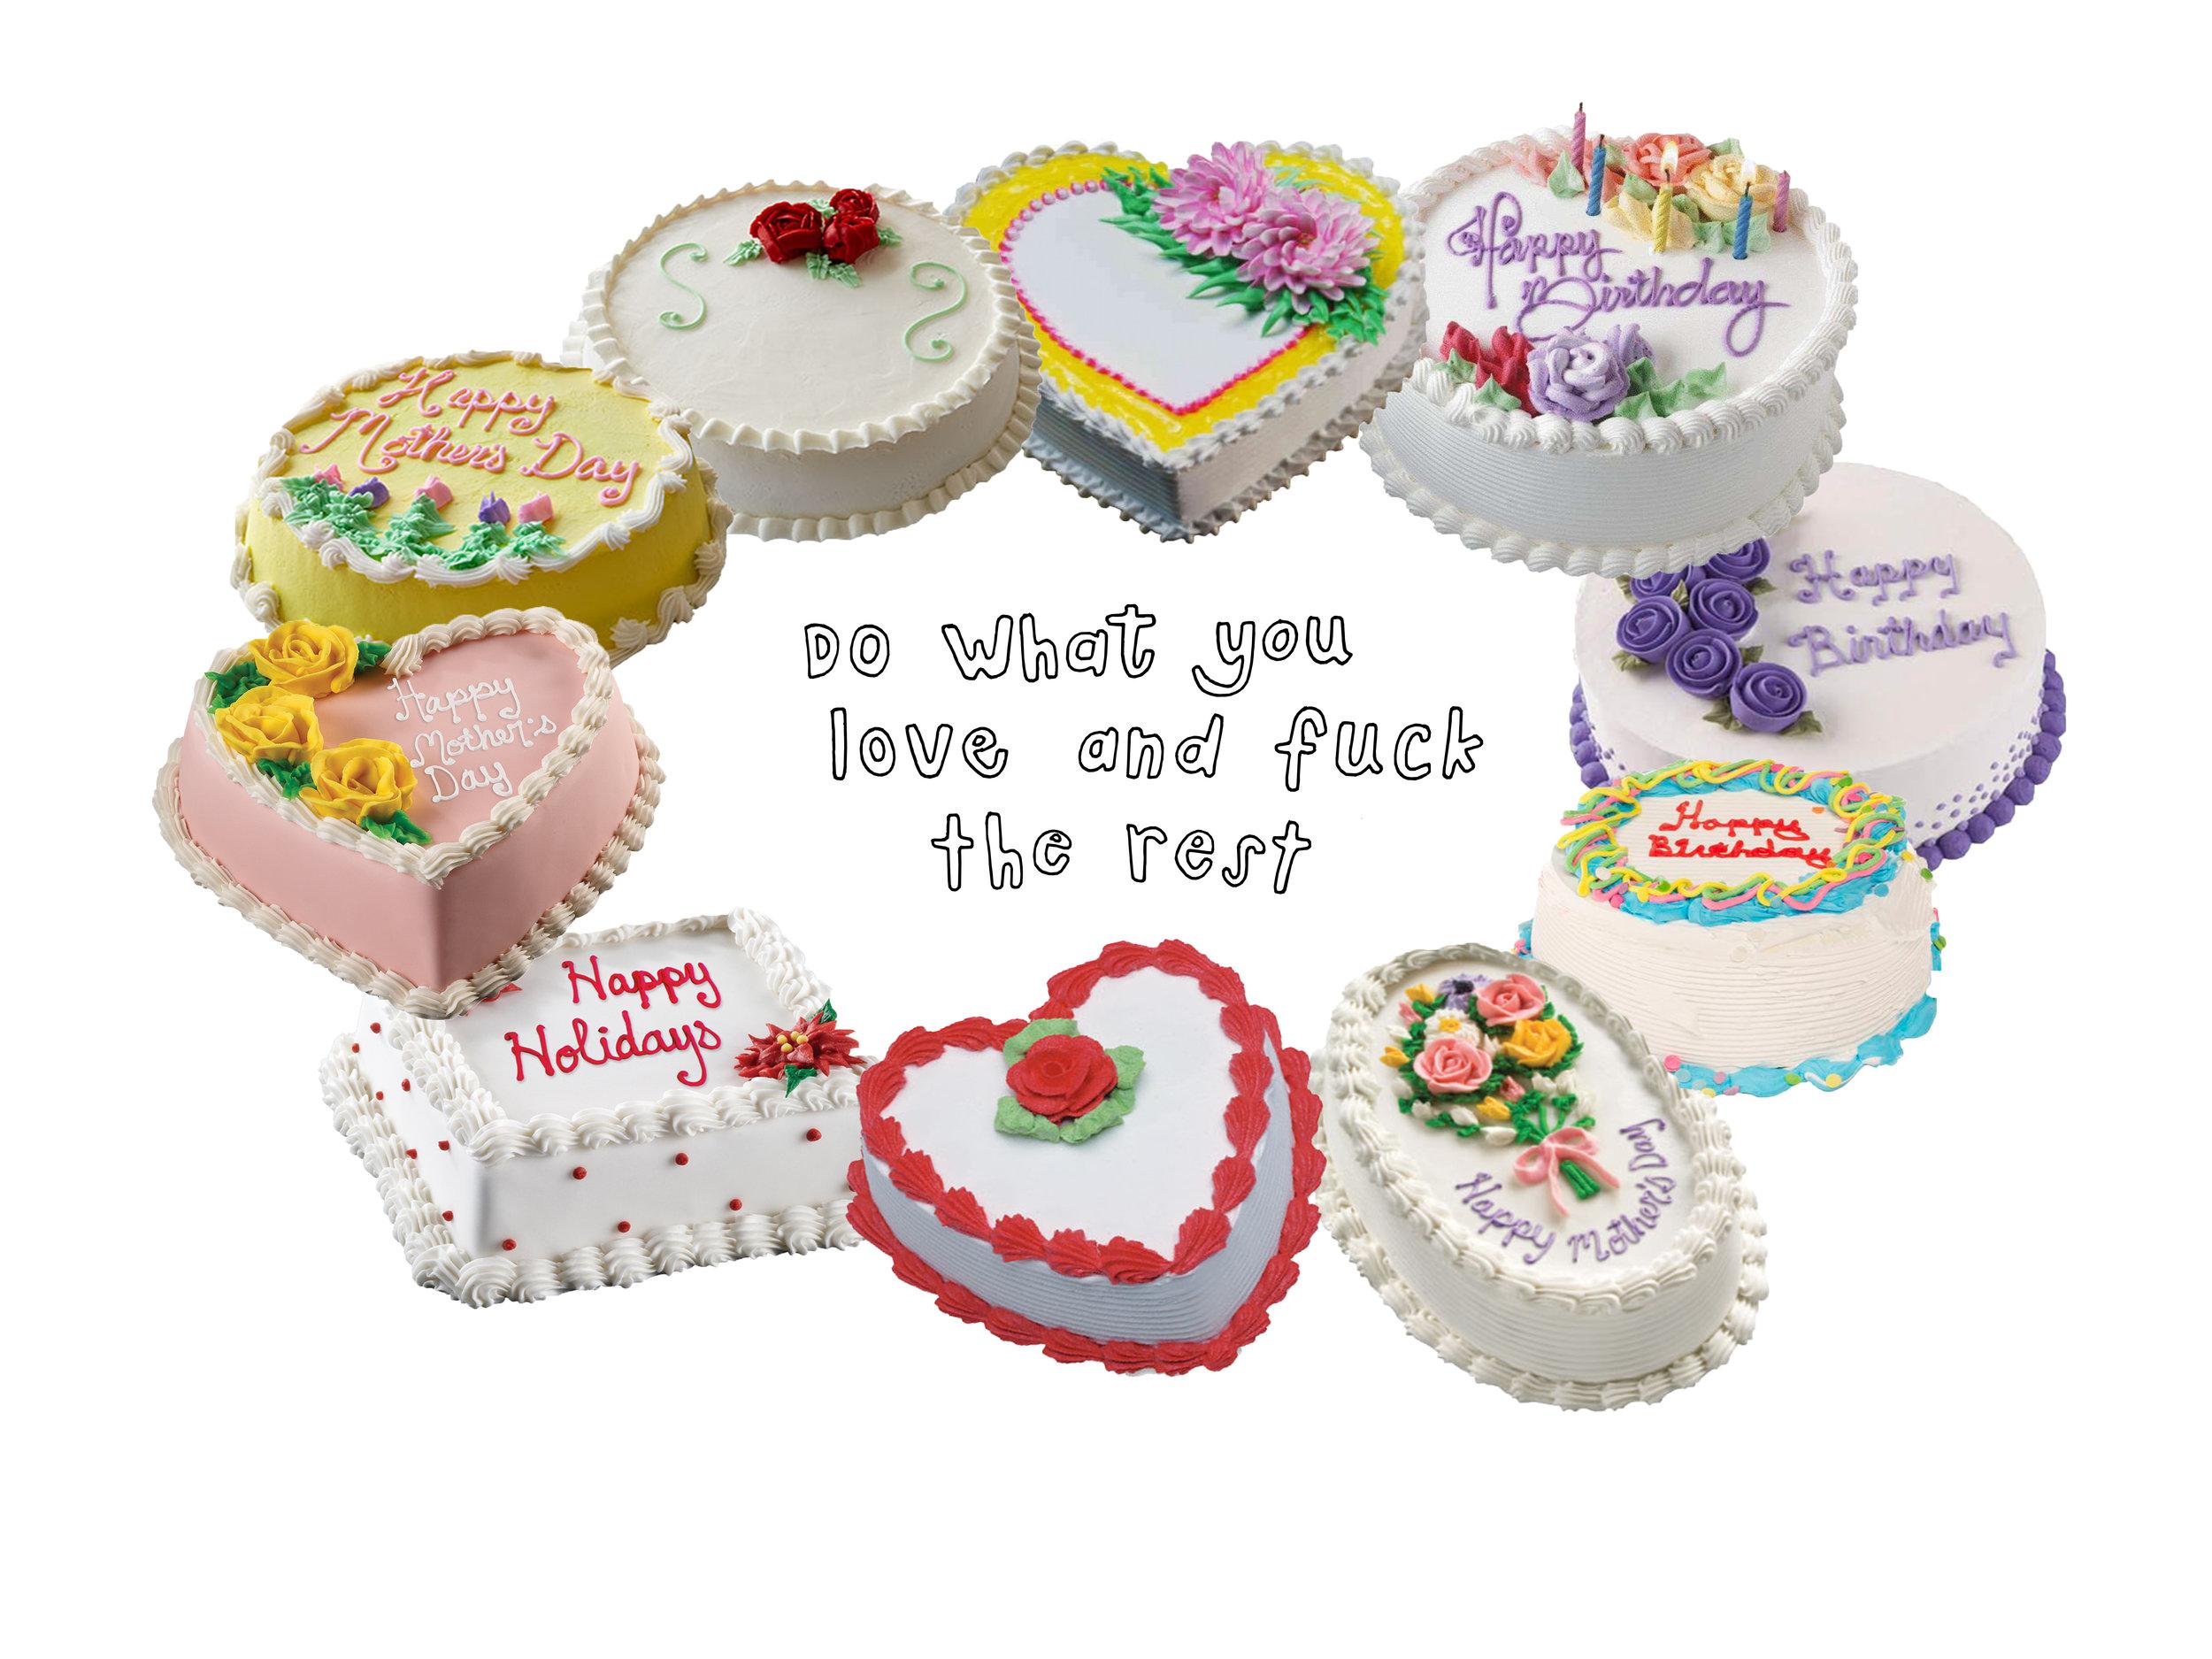 cakes_version1.jpg